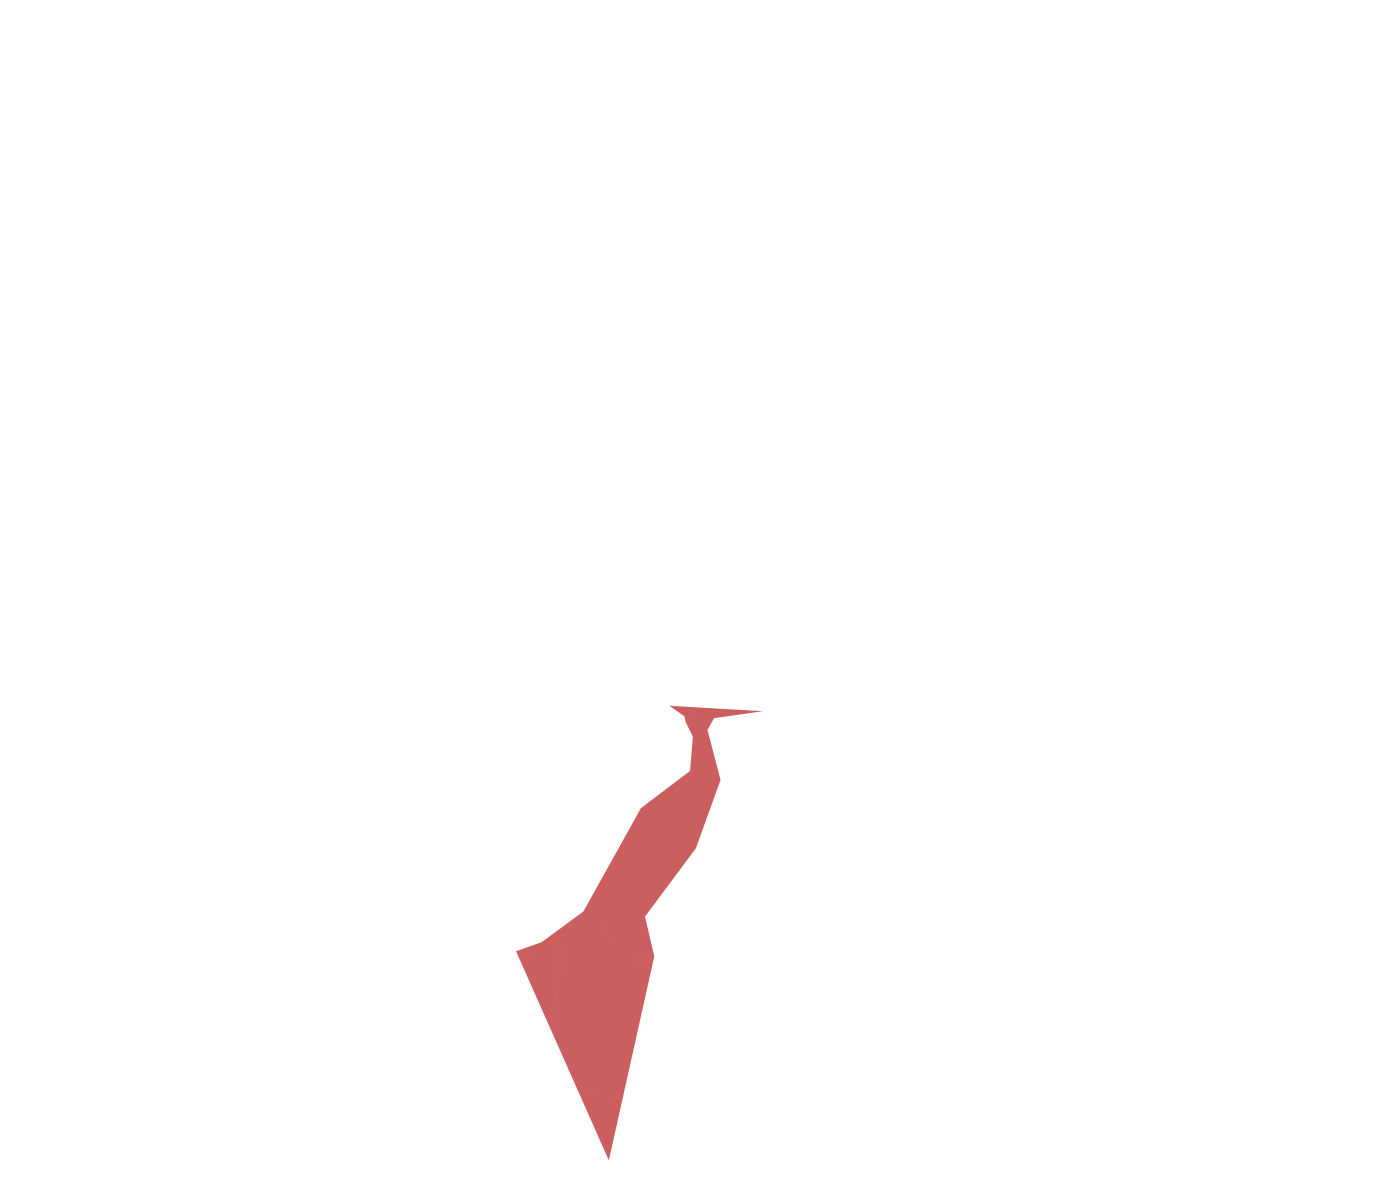 A volcano icon